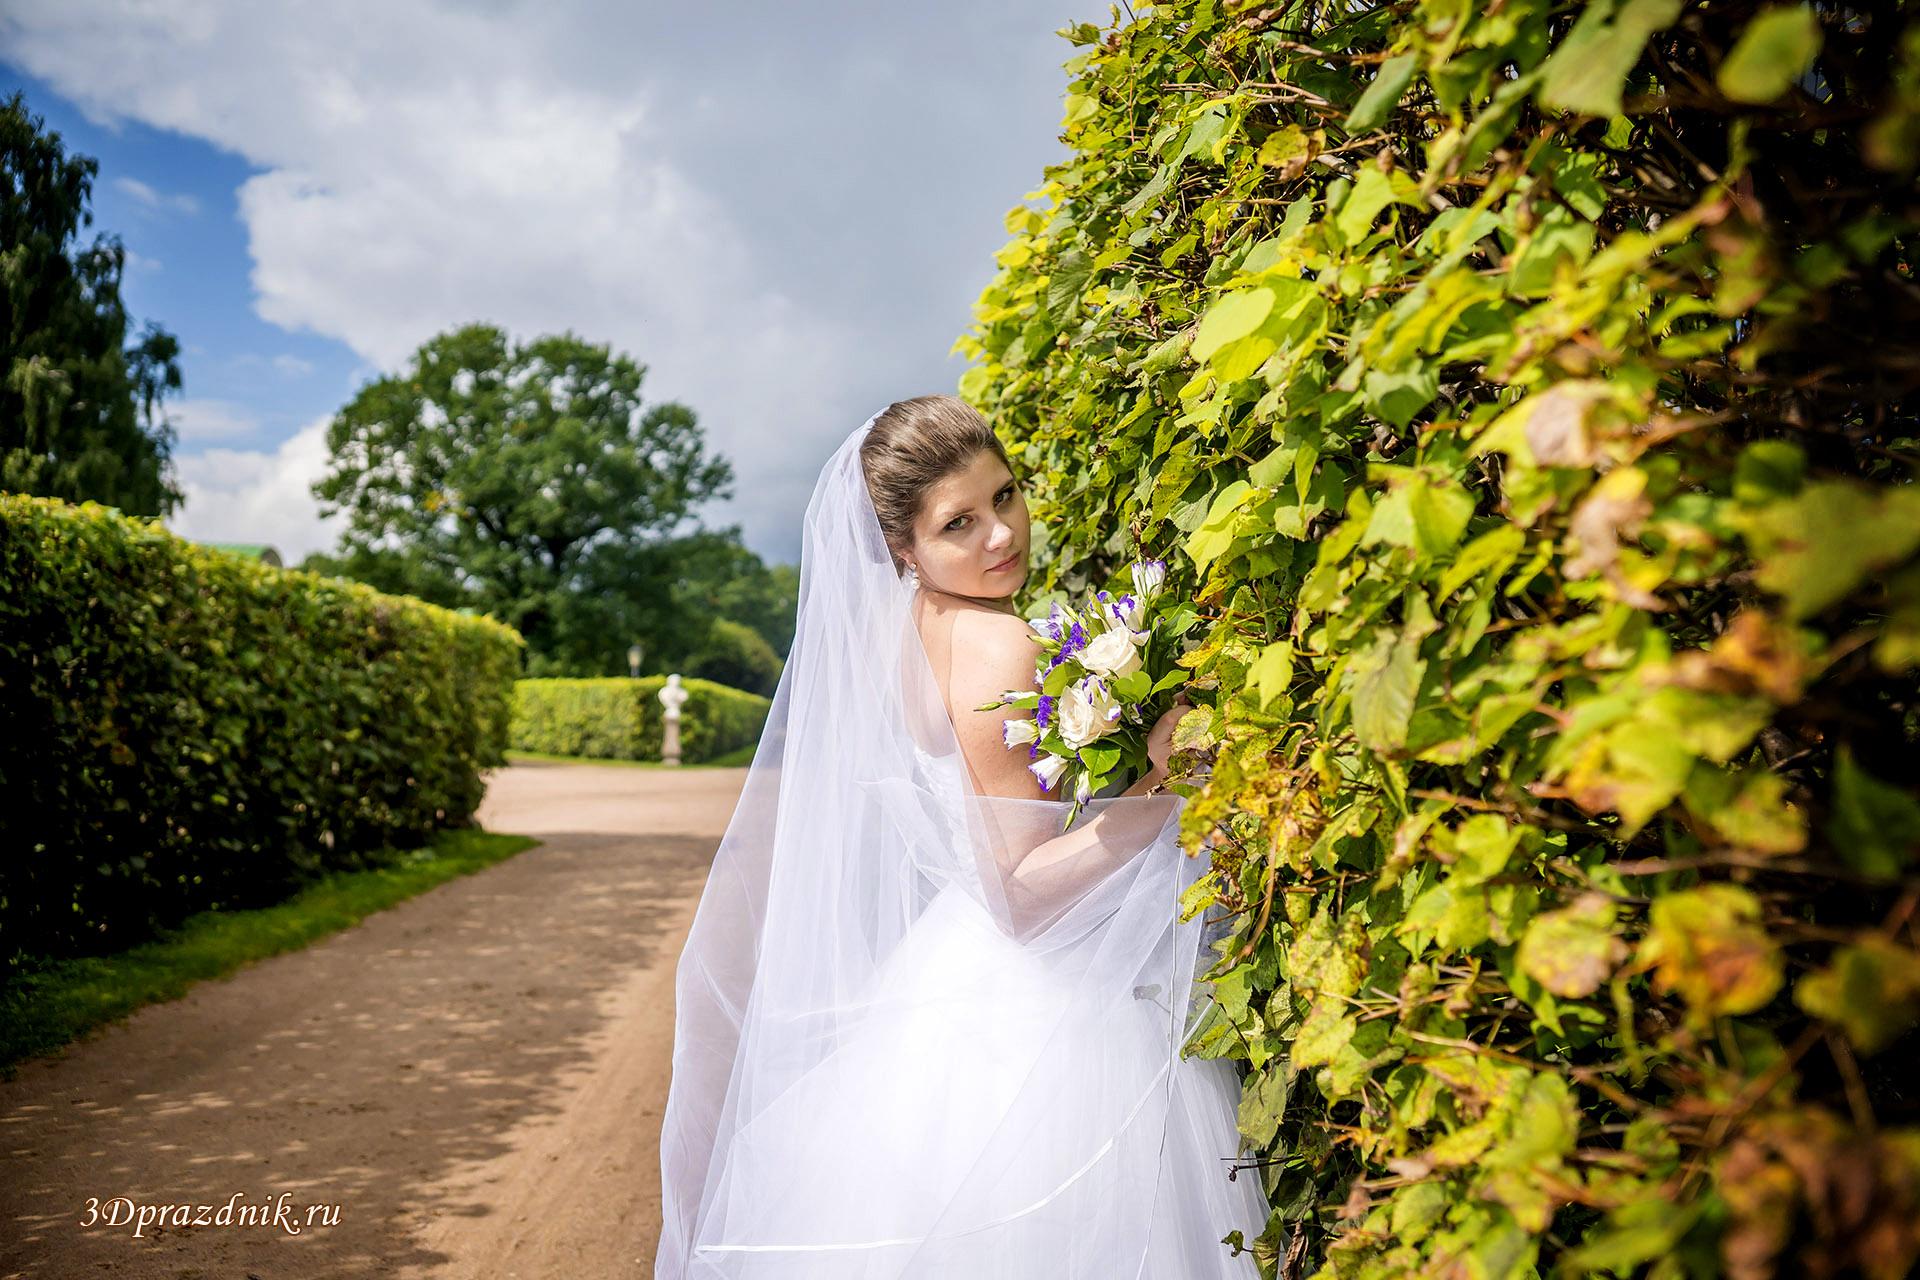 Невеста Ирина. Между летом и осенью